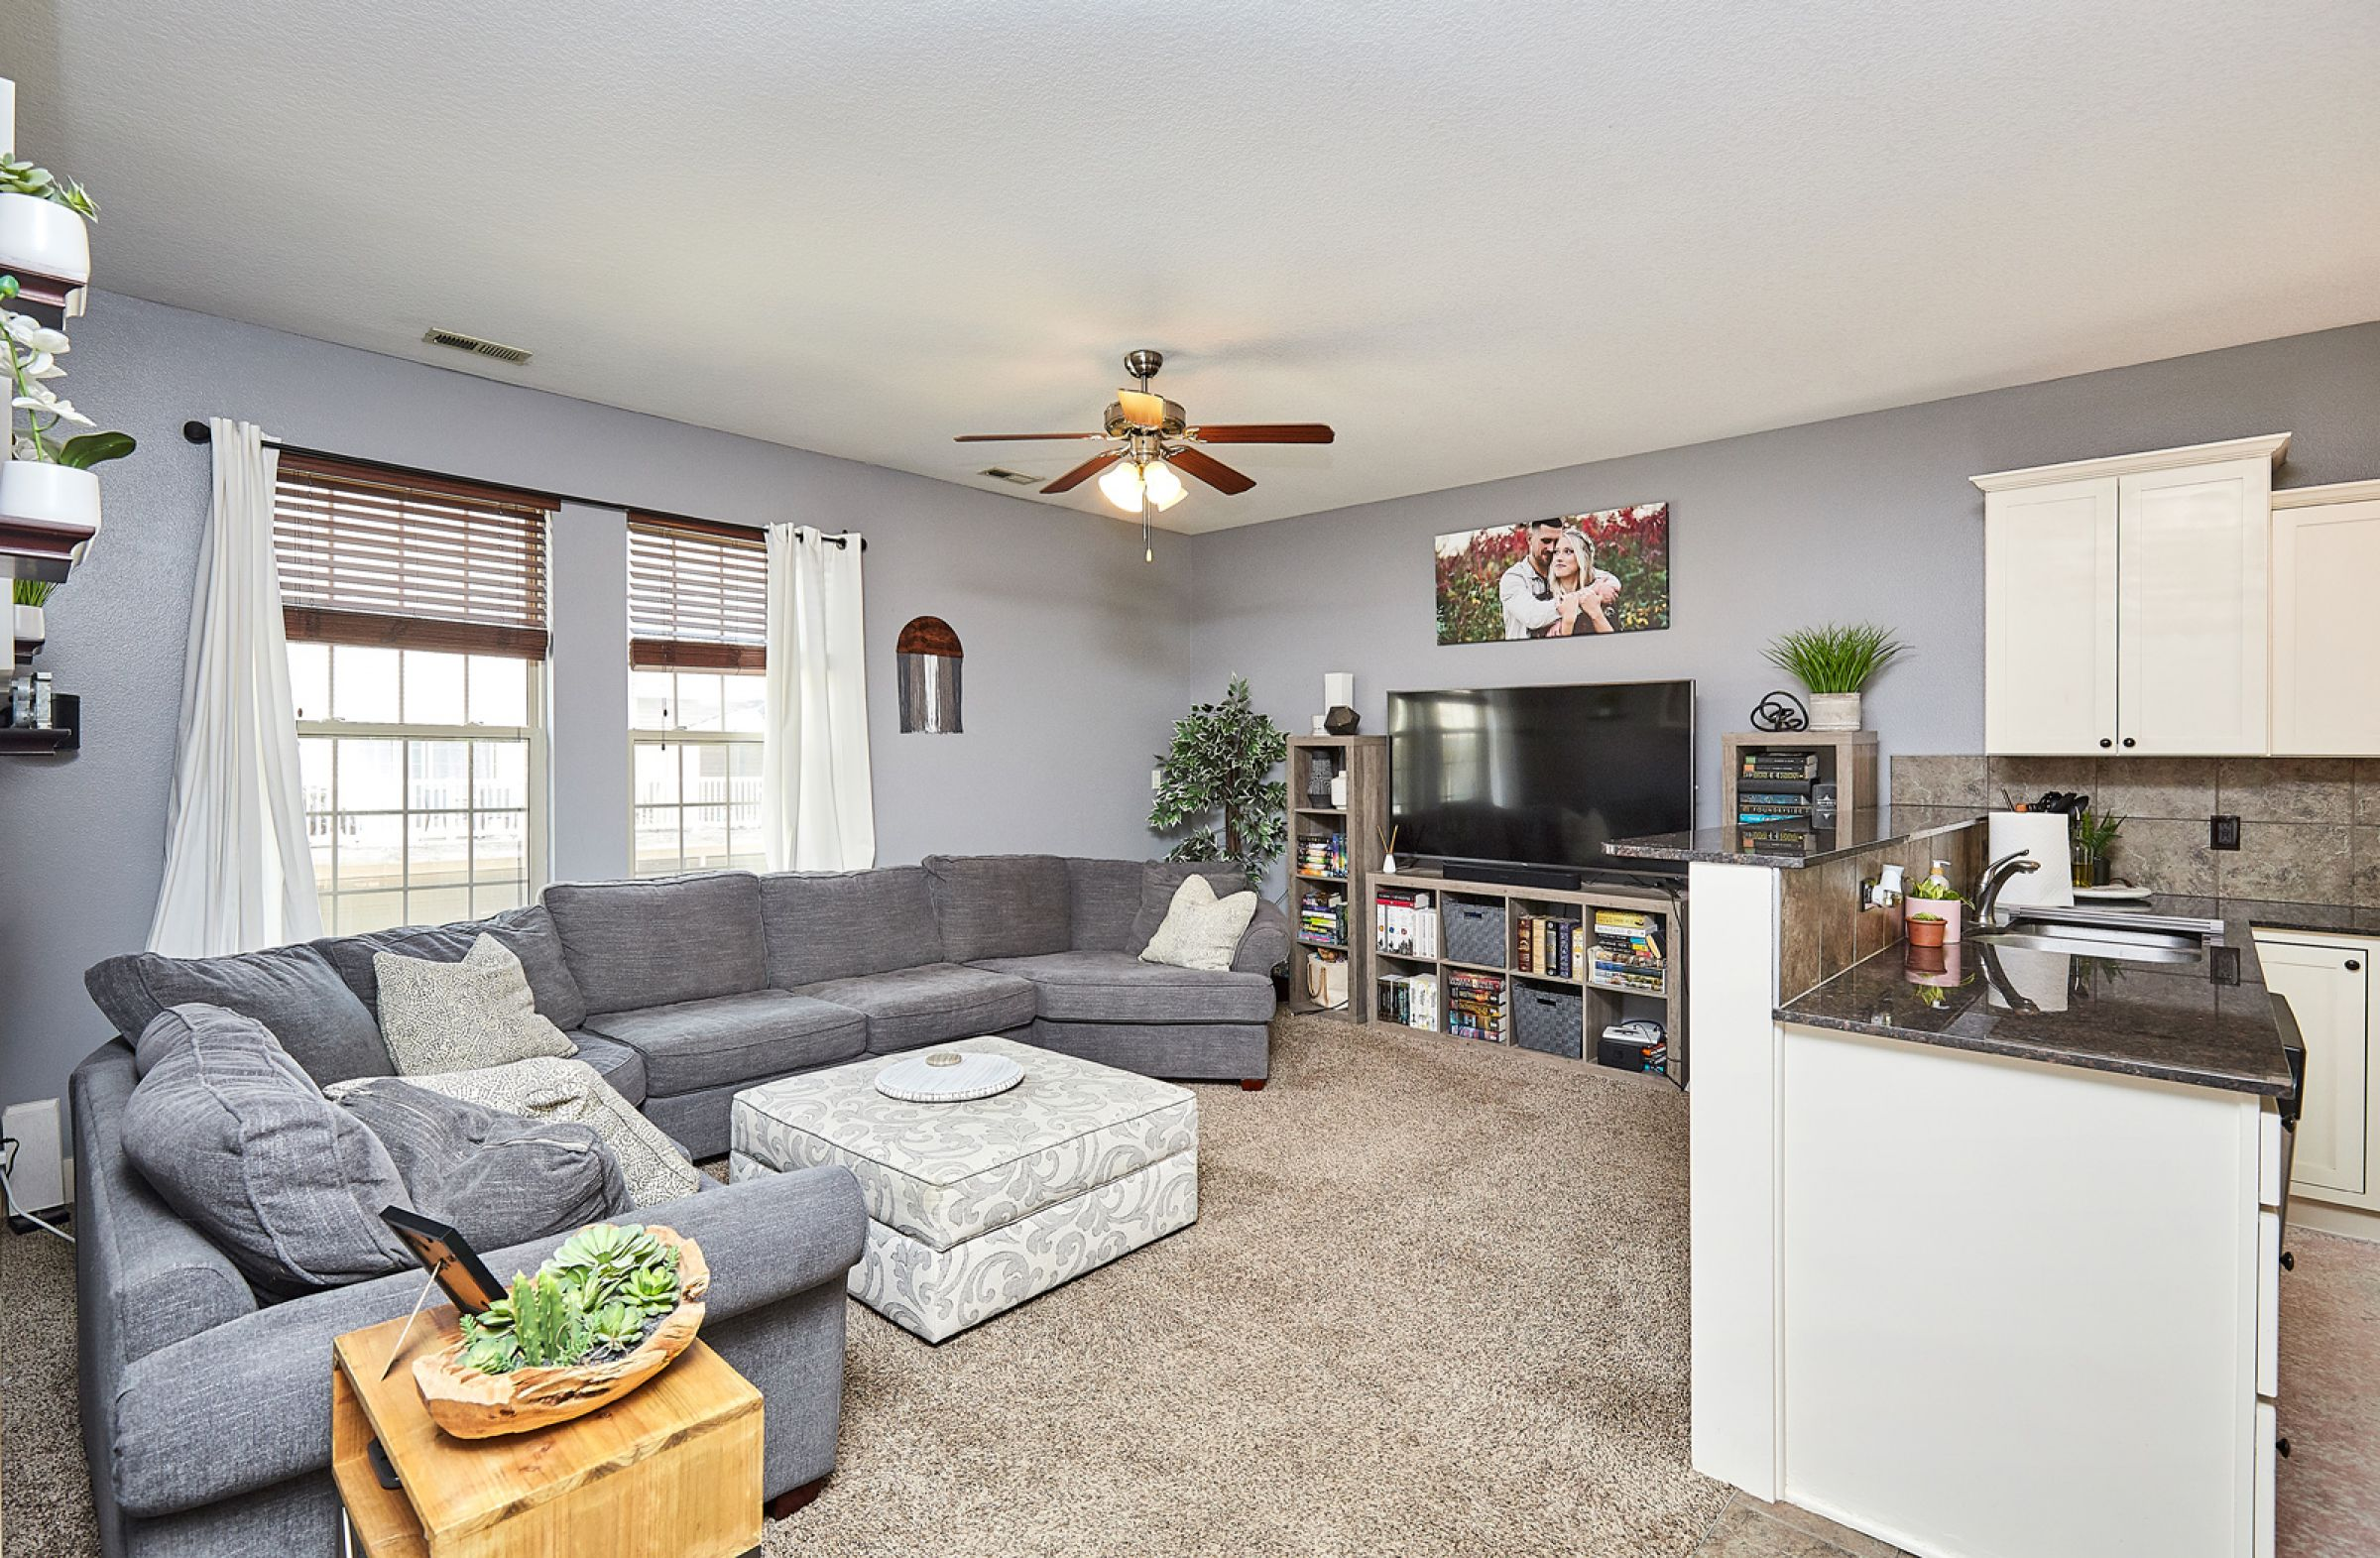 residential-polk-county-iowa-0-acres-listing-number-15662-3-2021-08-03-023303.jpg